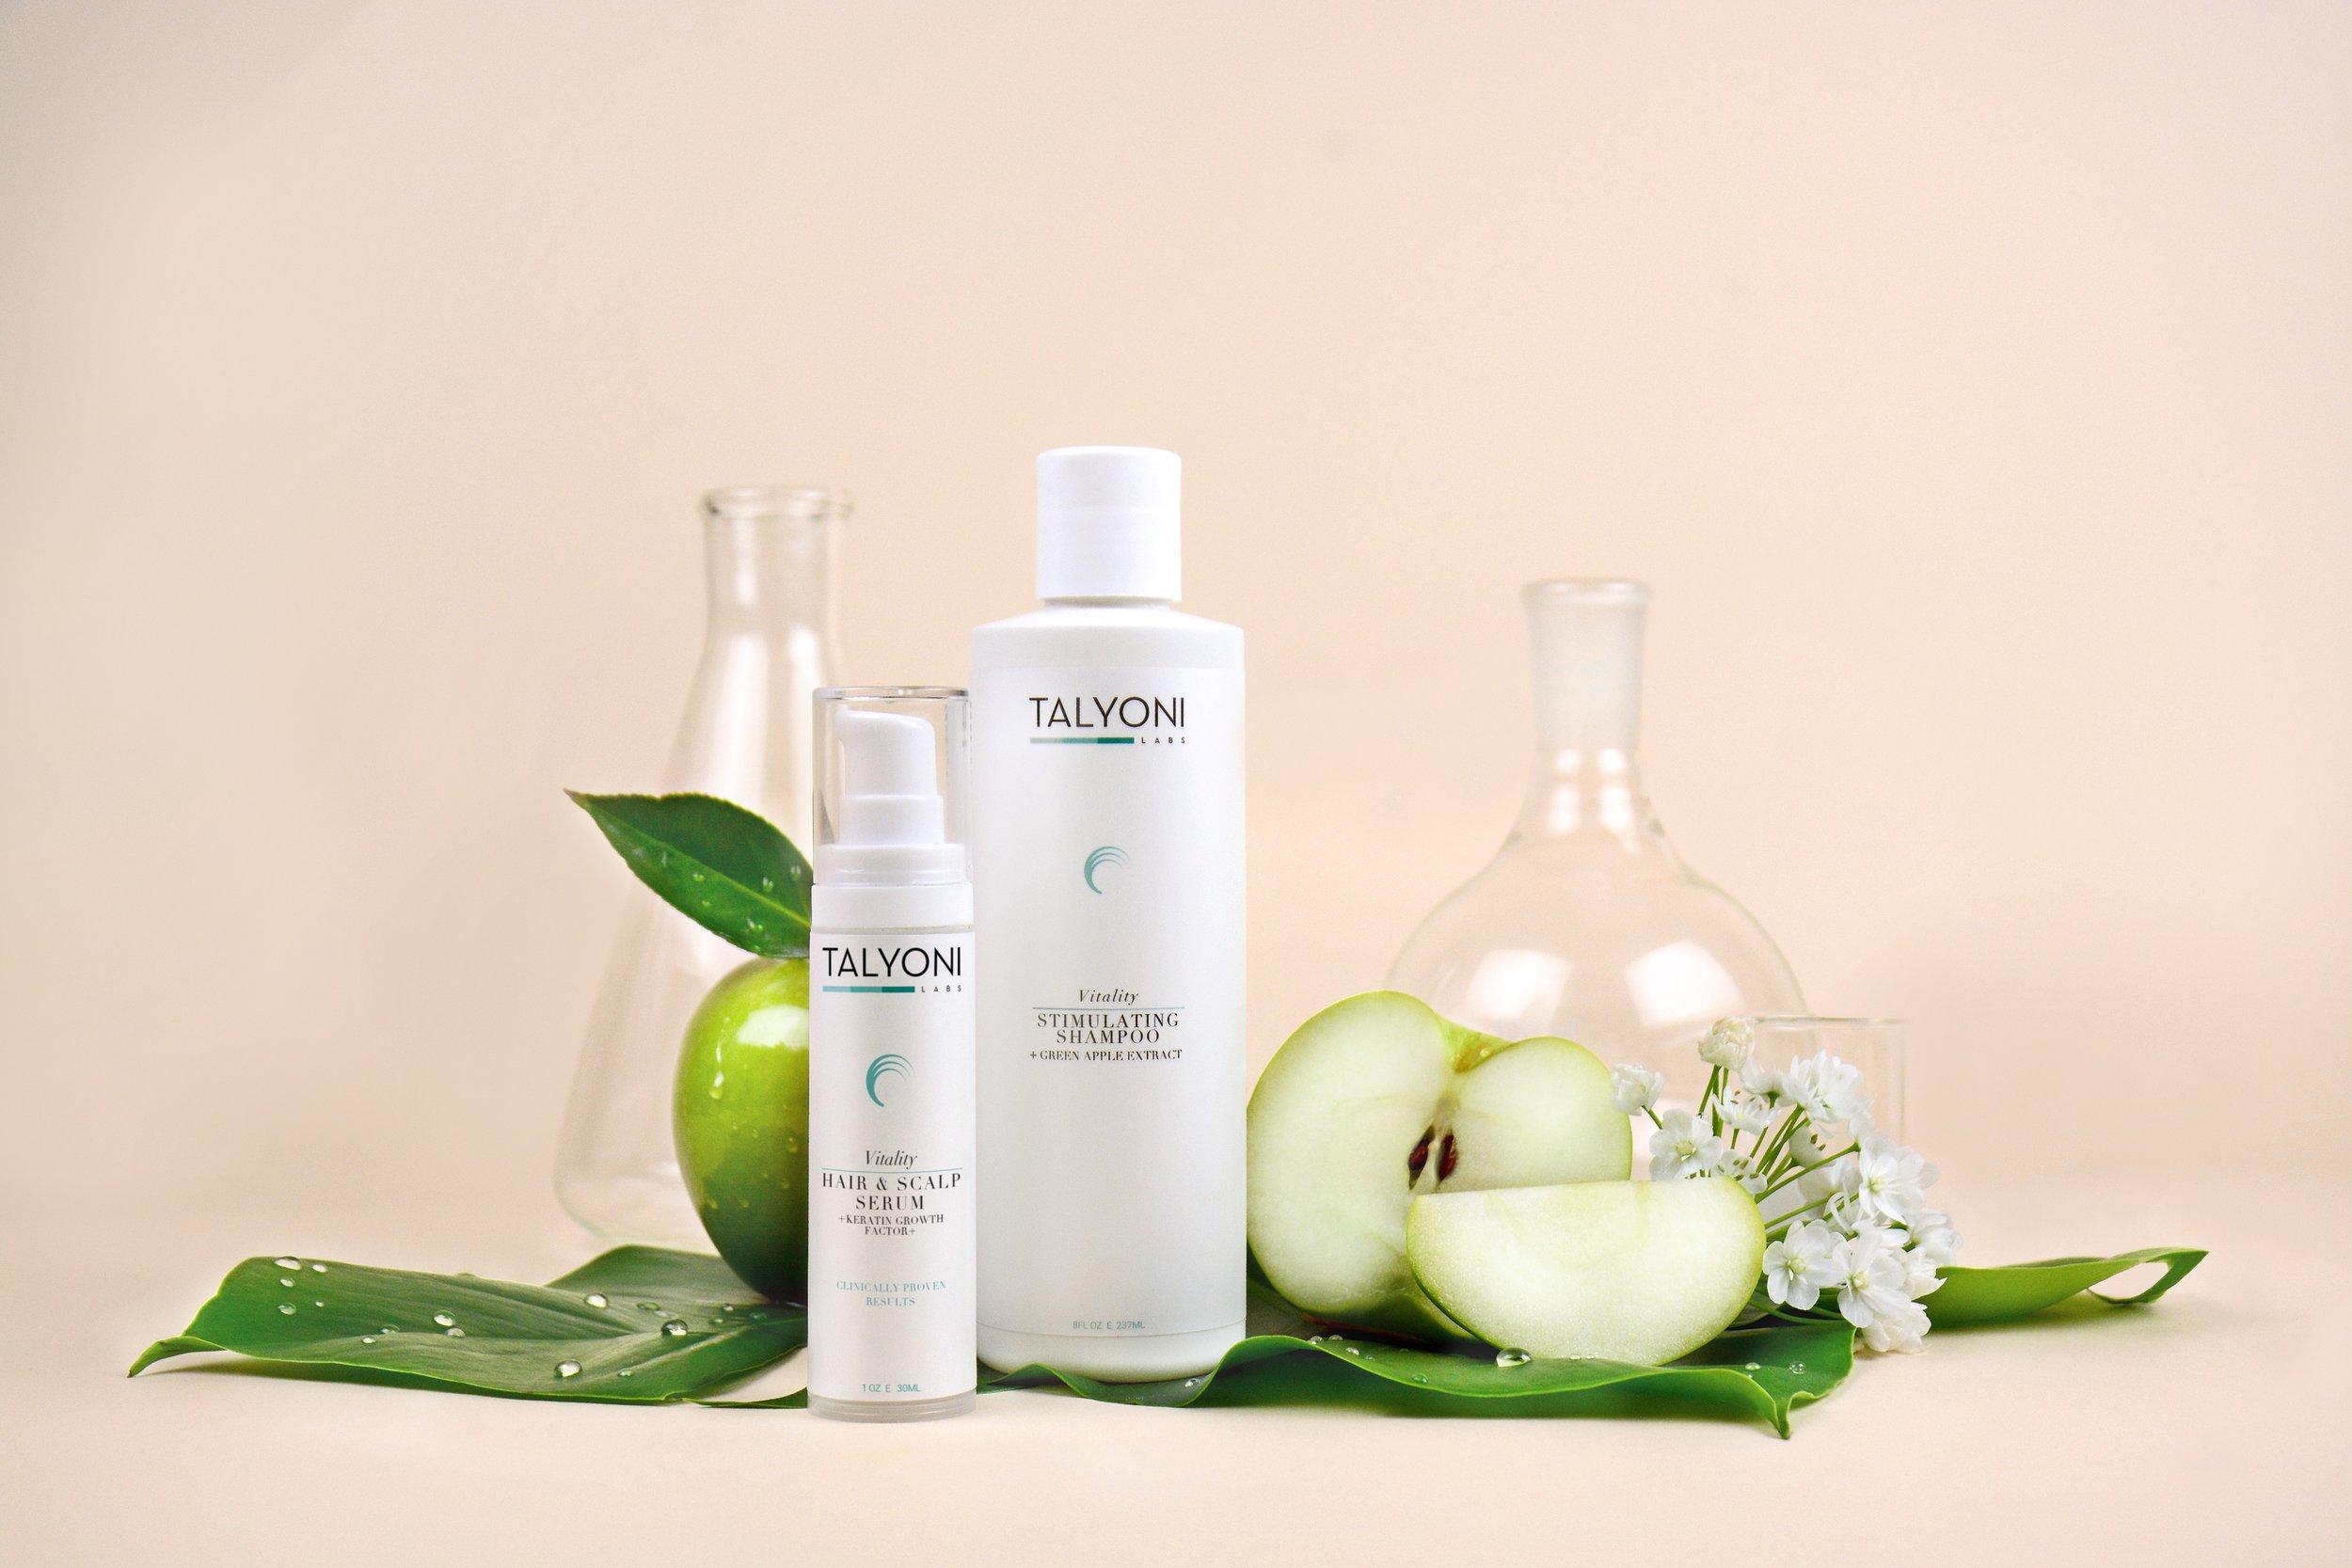 Talyoni Vitality Hair & Scalp Serum.jpg